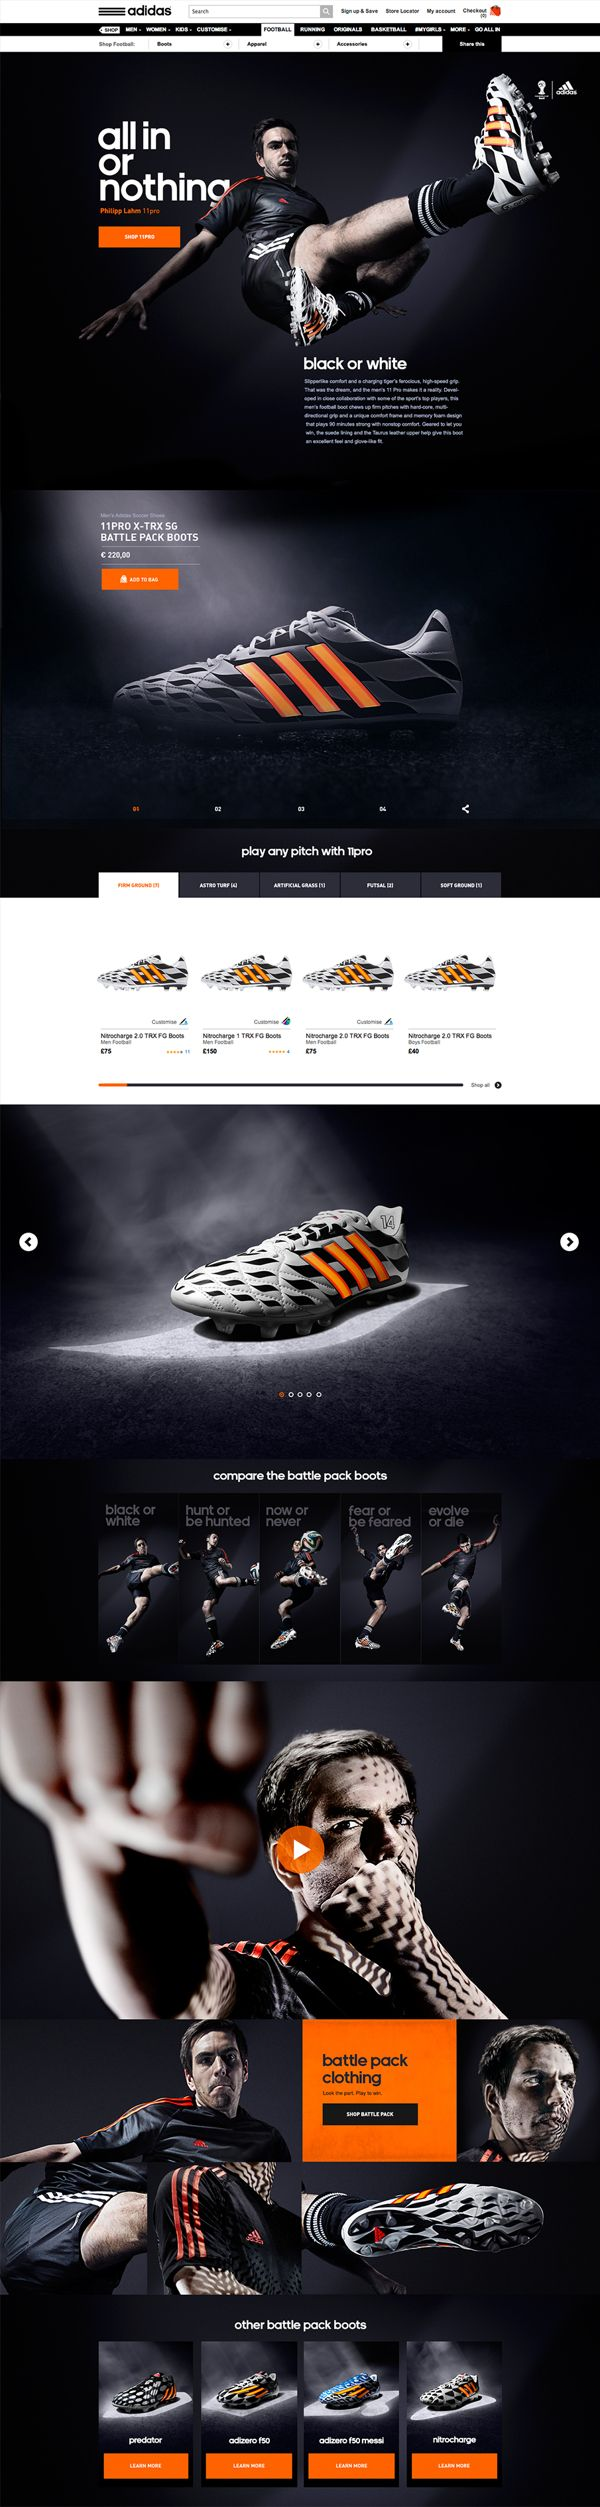 https://www.behance.net/gallery/16668633/adidas-Battle-Pack